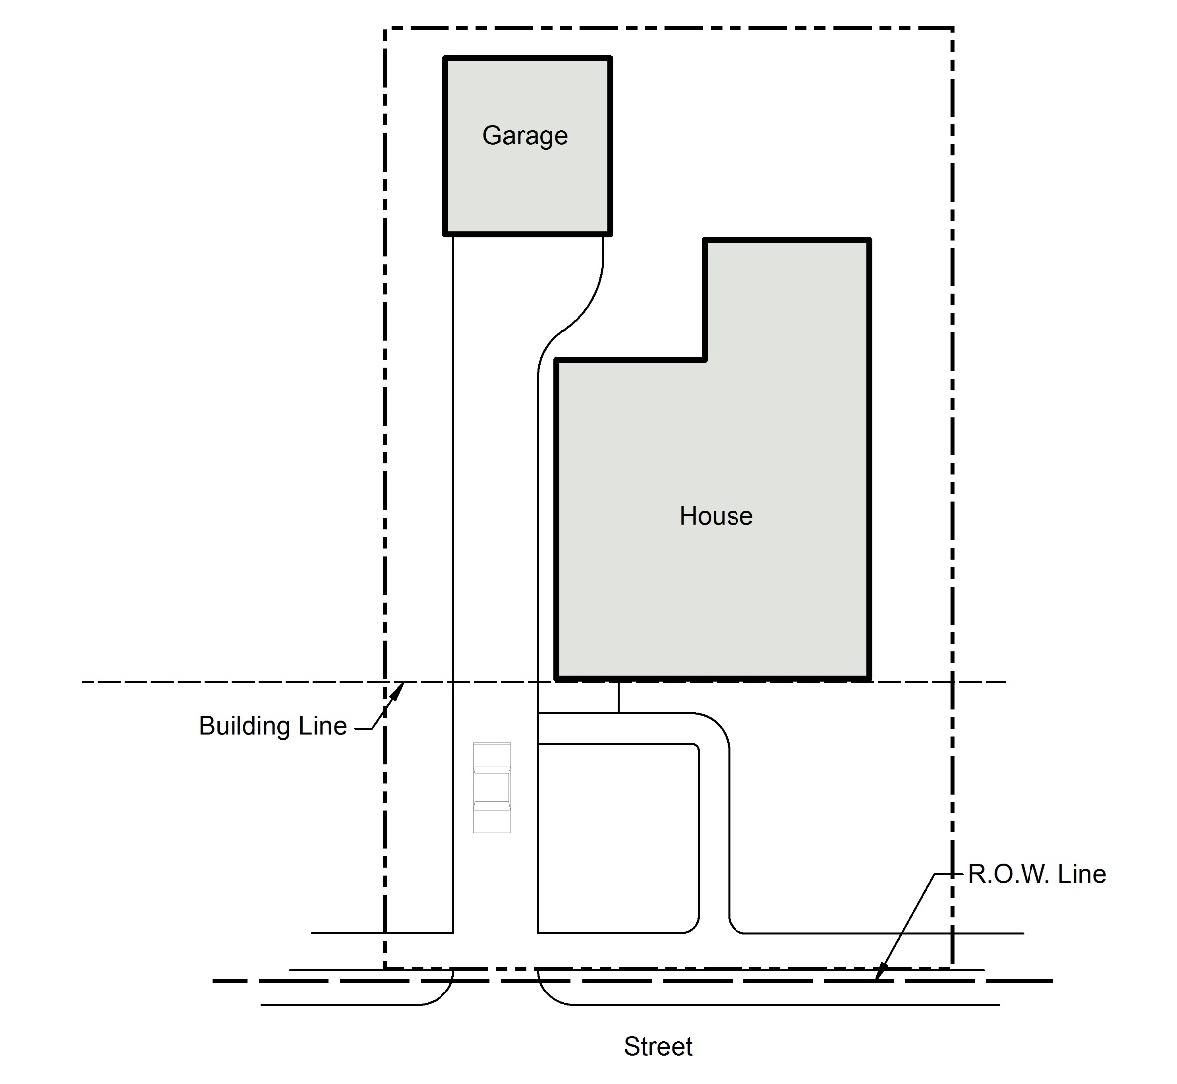 Garage Wiring Basic Wiring To Detached Garage The Garage Journal